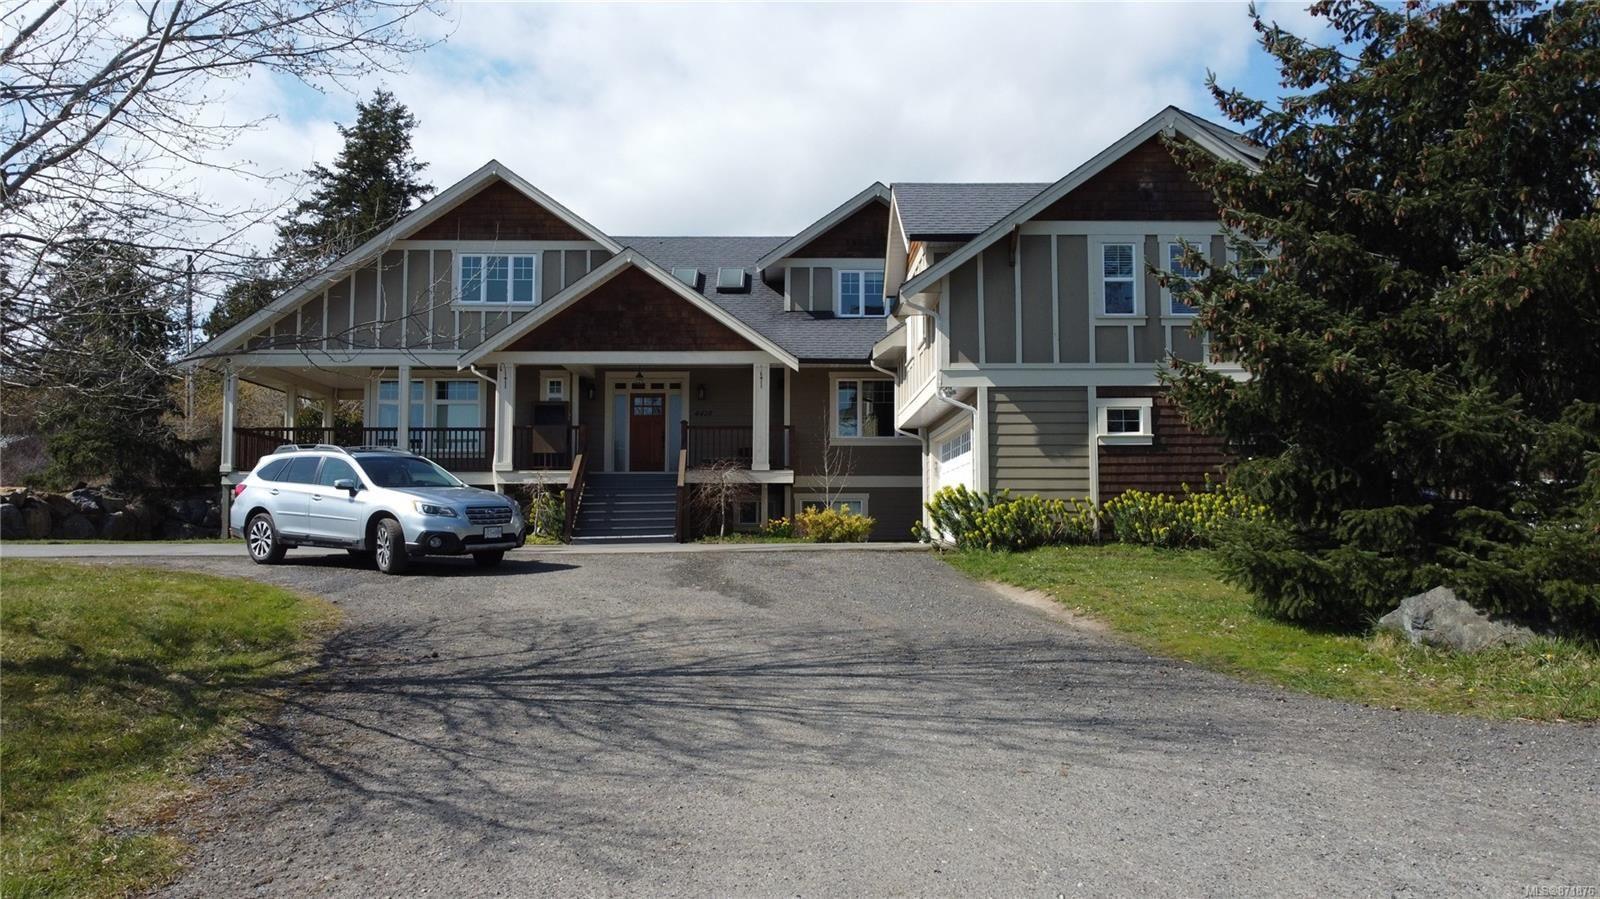 Photo 3: Photos: 4420 Wilkinson Rd in : SW Royal Oak House for sale (Saanich West)  : MLS®# 871876